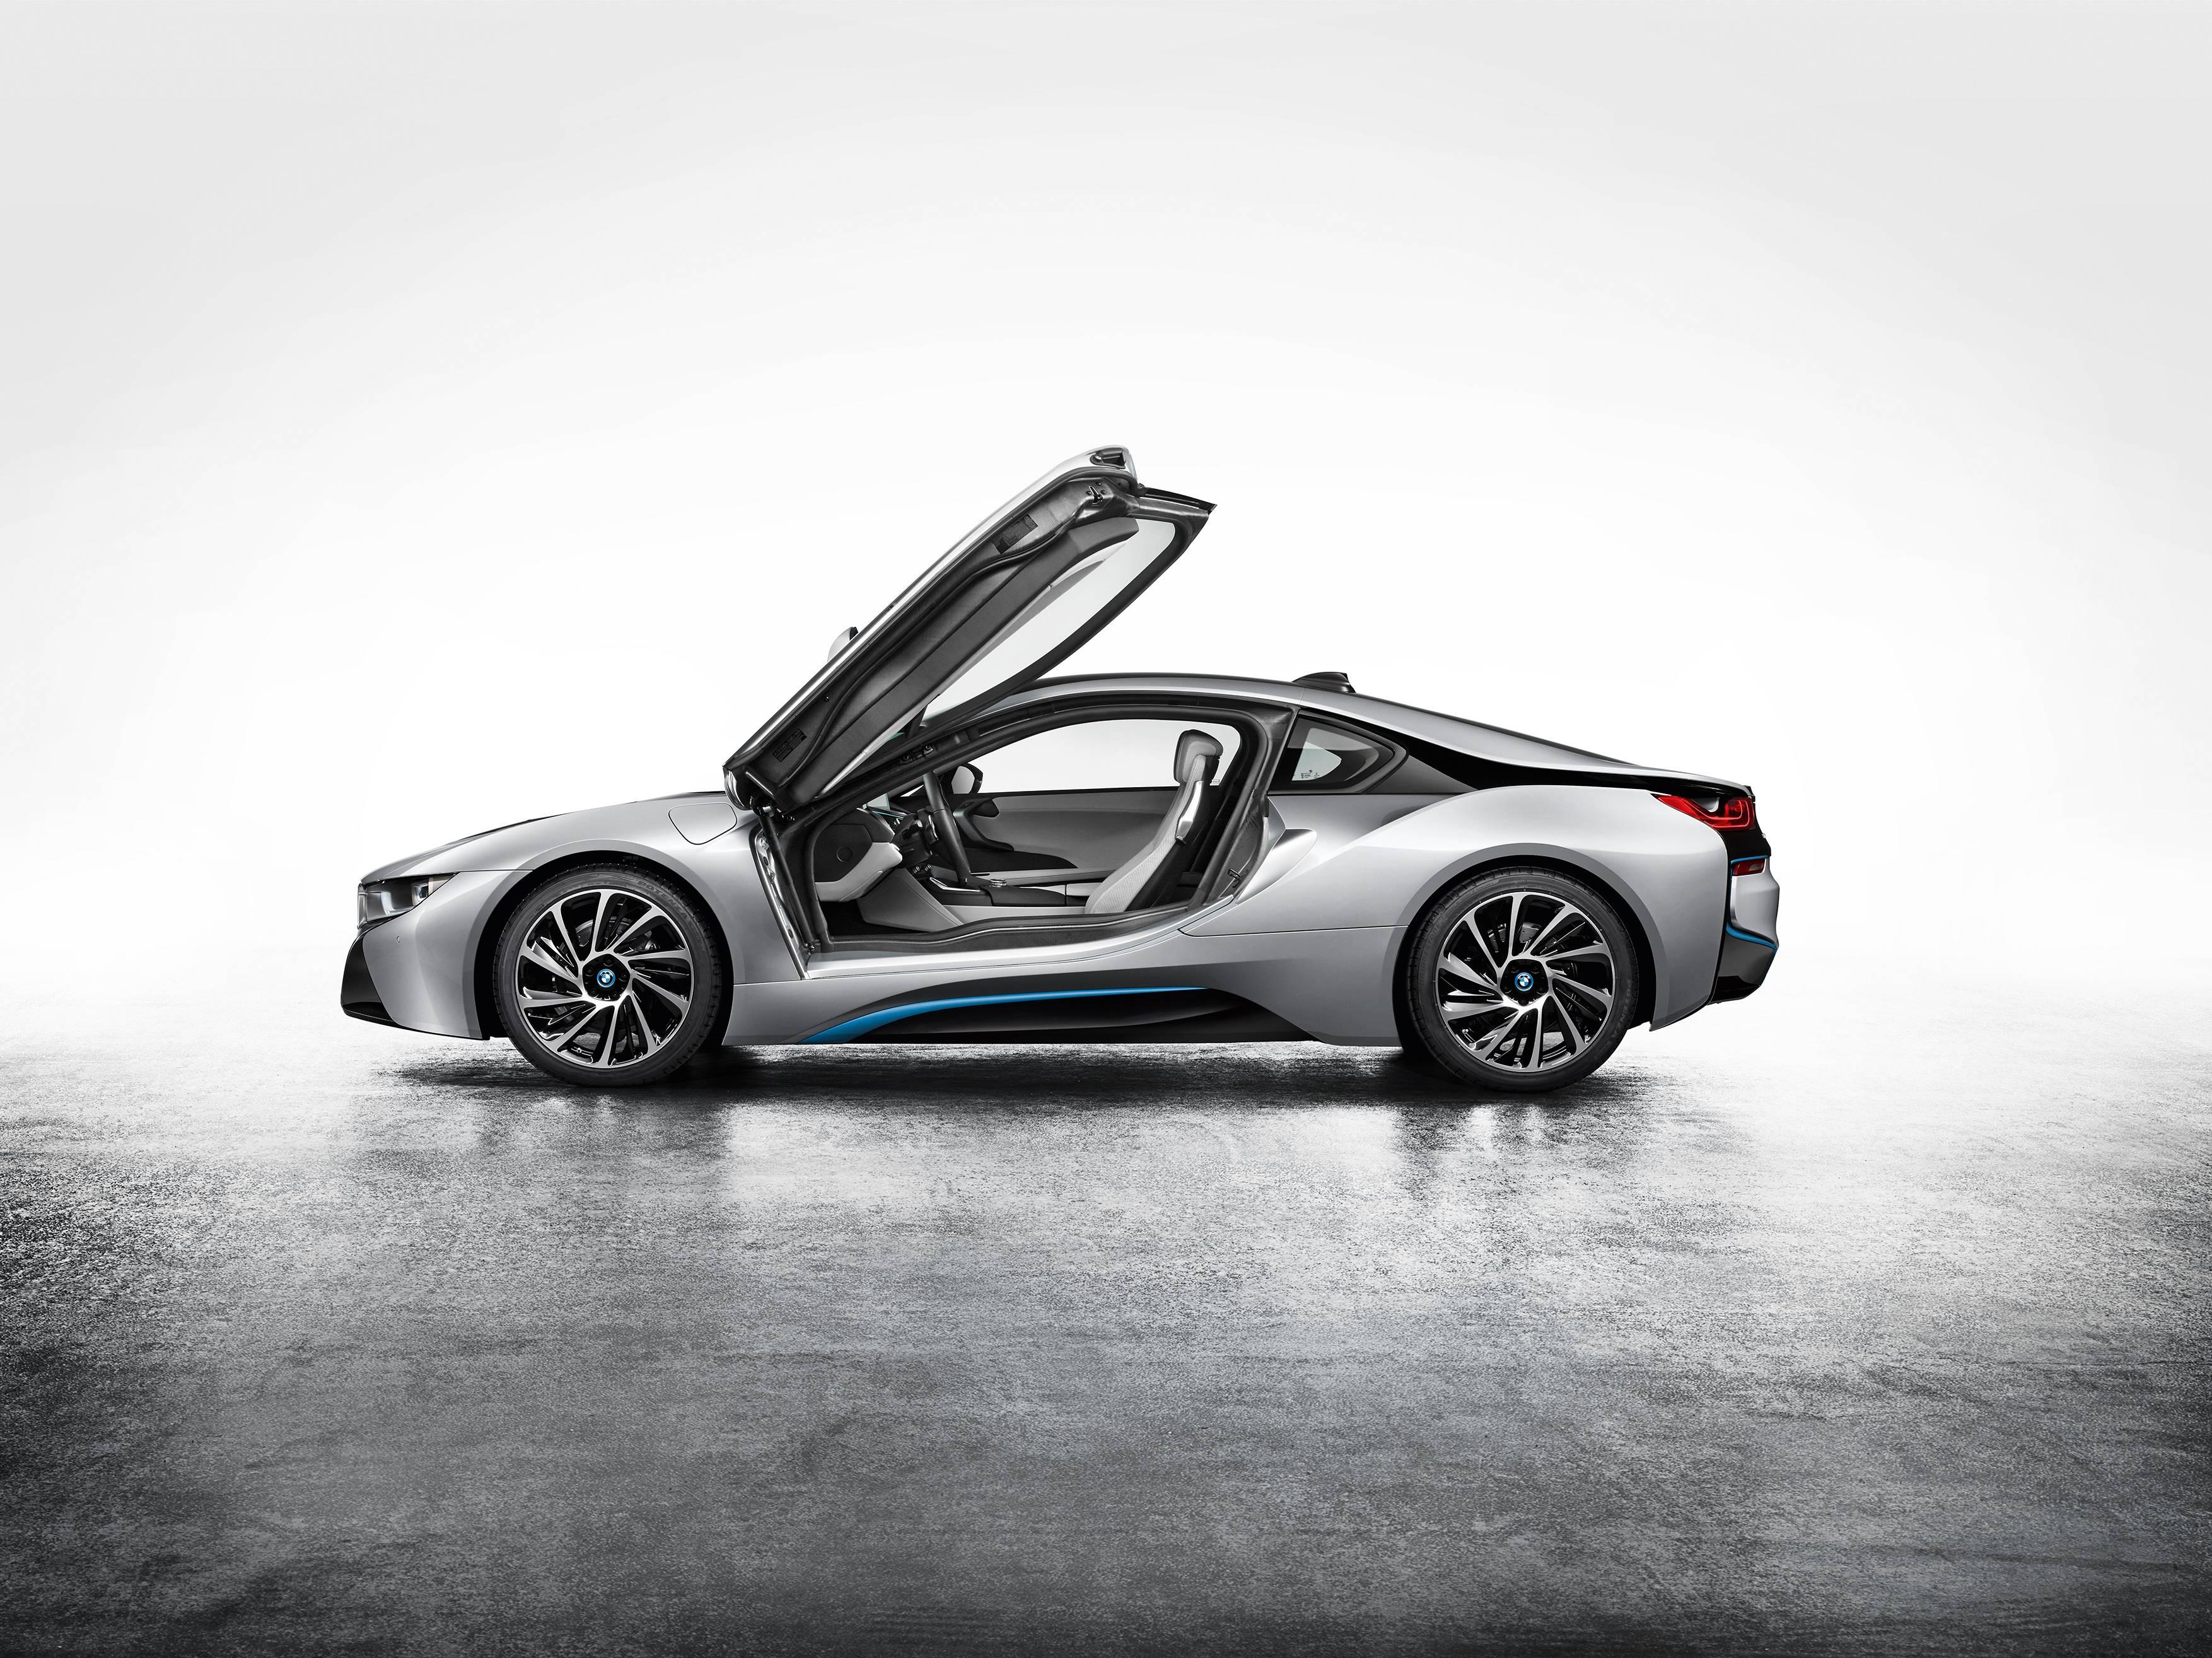 BMW i8 Profile Doors Up